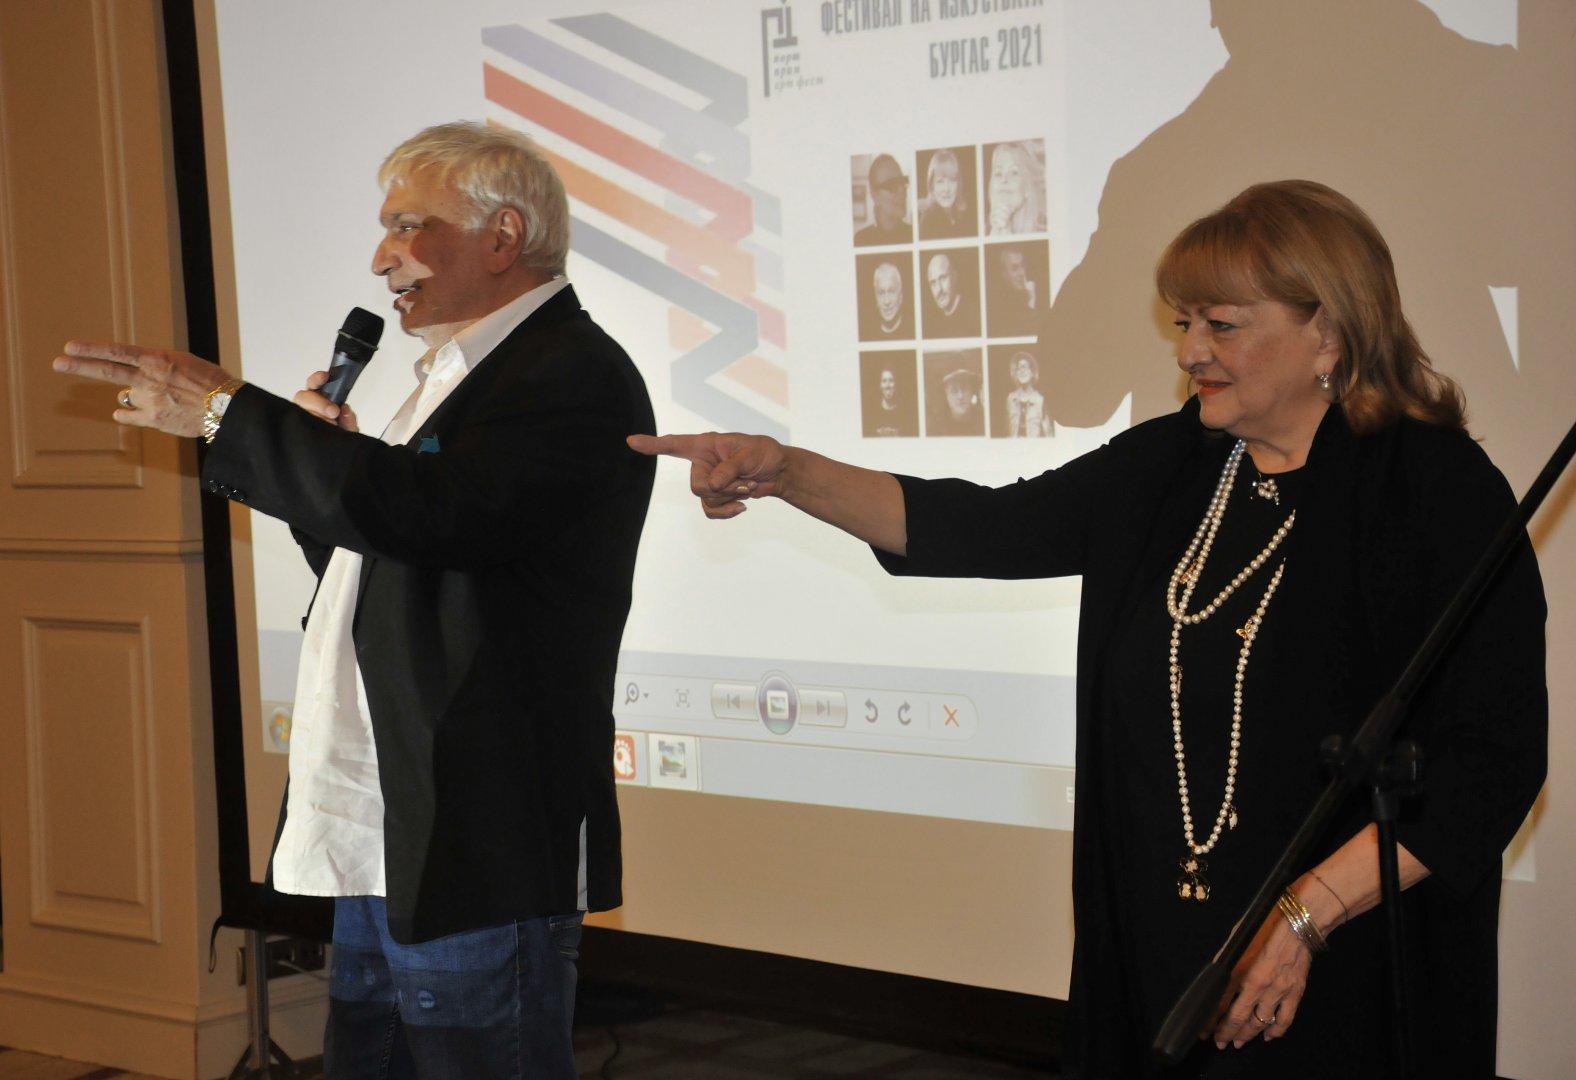 Стефан Димитров и Богдана Карадочева представиха в Бургас книгата си Безнадежден случай